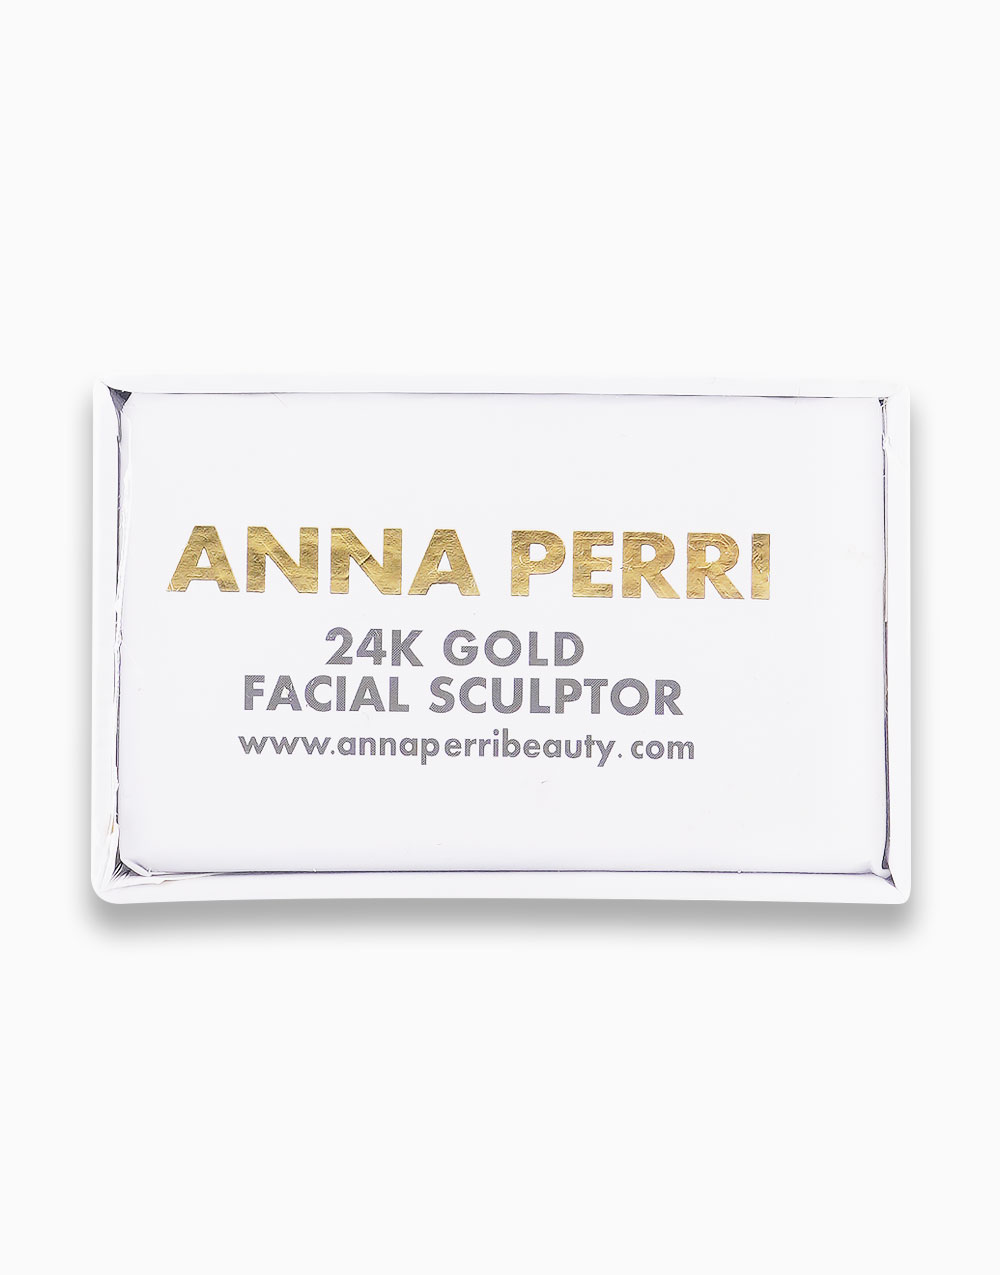 24K Gold Face Sculptor by Anna Perri Beauty